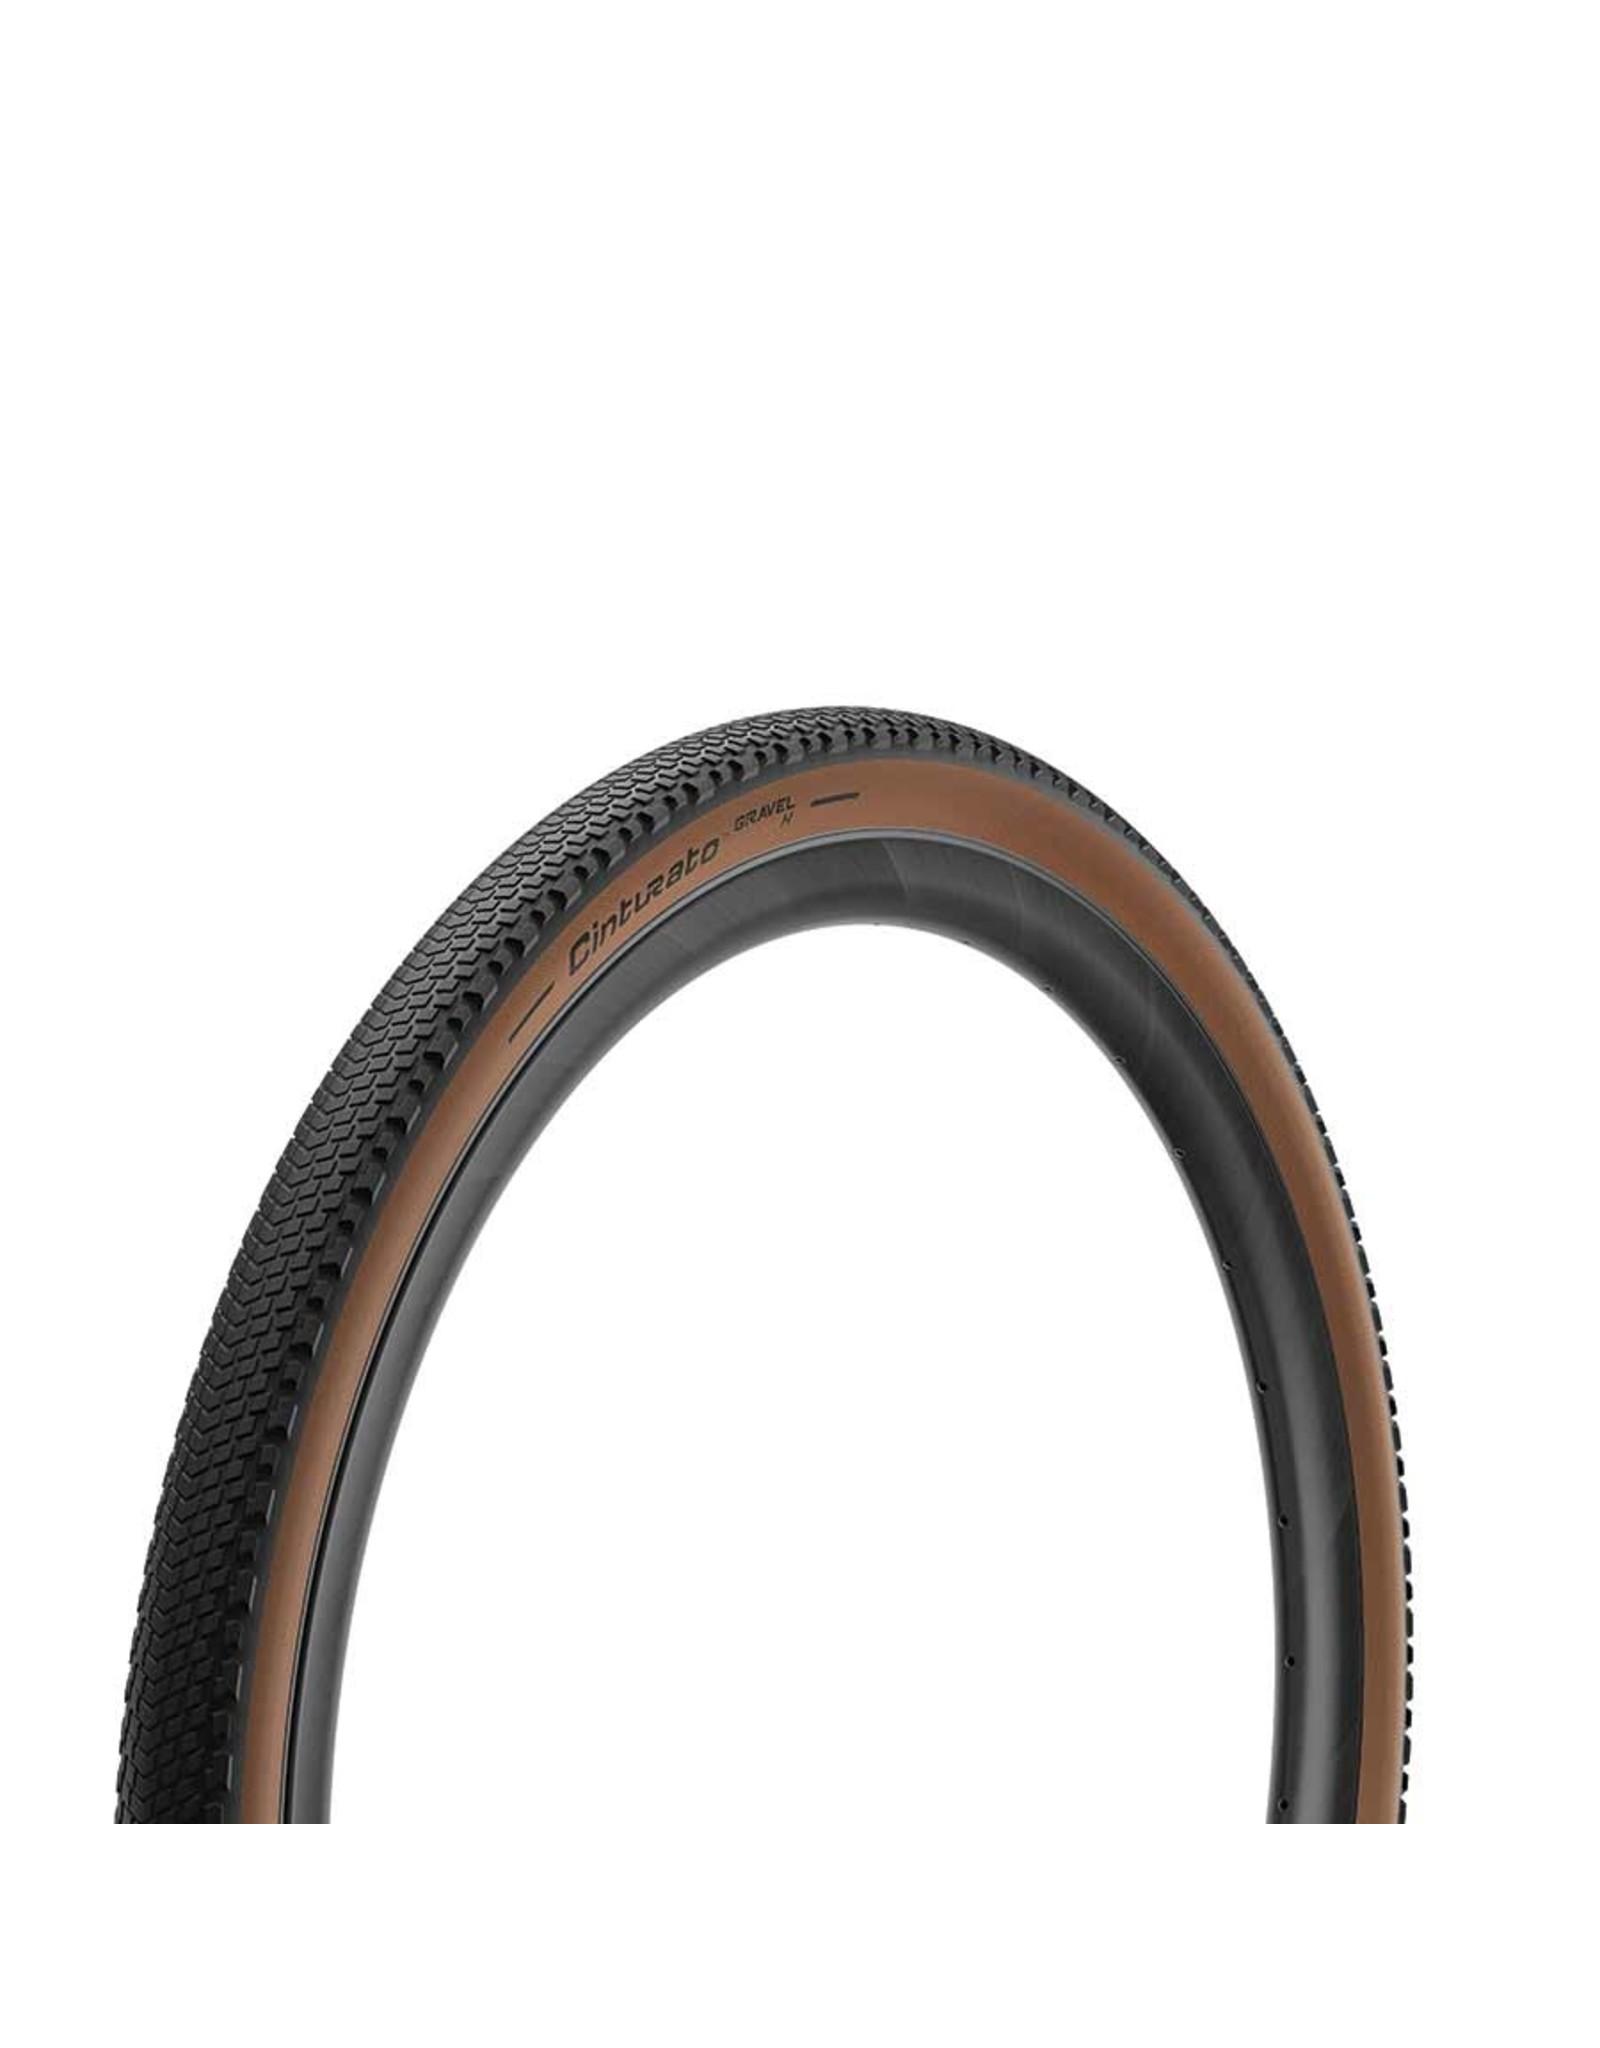 Pirelli, Cinturato Gravel H, Tire, 700x40C, Folding, Tubeless Ready, SpeedGrip, 127TPI, Beige